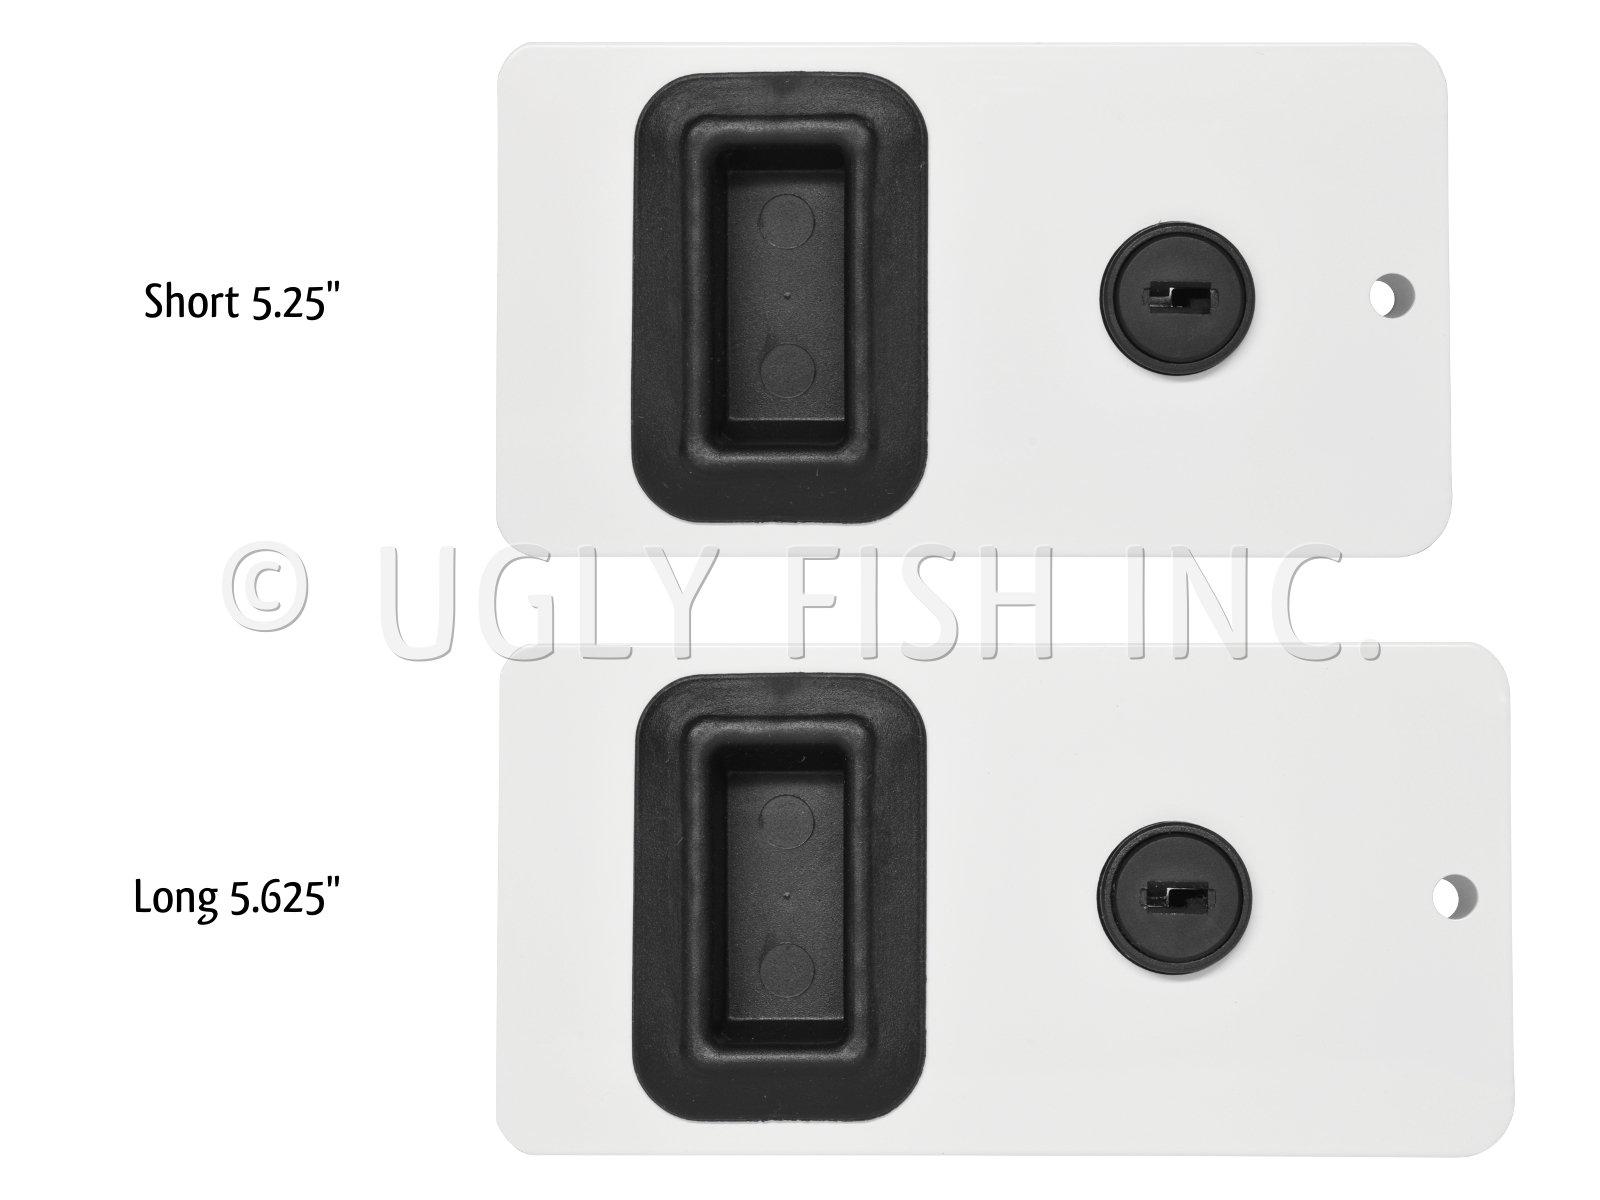 NEW SOUTHCO BOAT BLACK SEALED SLIDING CABIN ENTRY DOOR LATCH LOCK MF-02-110-50